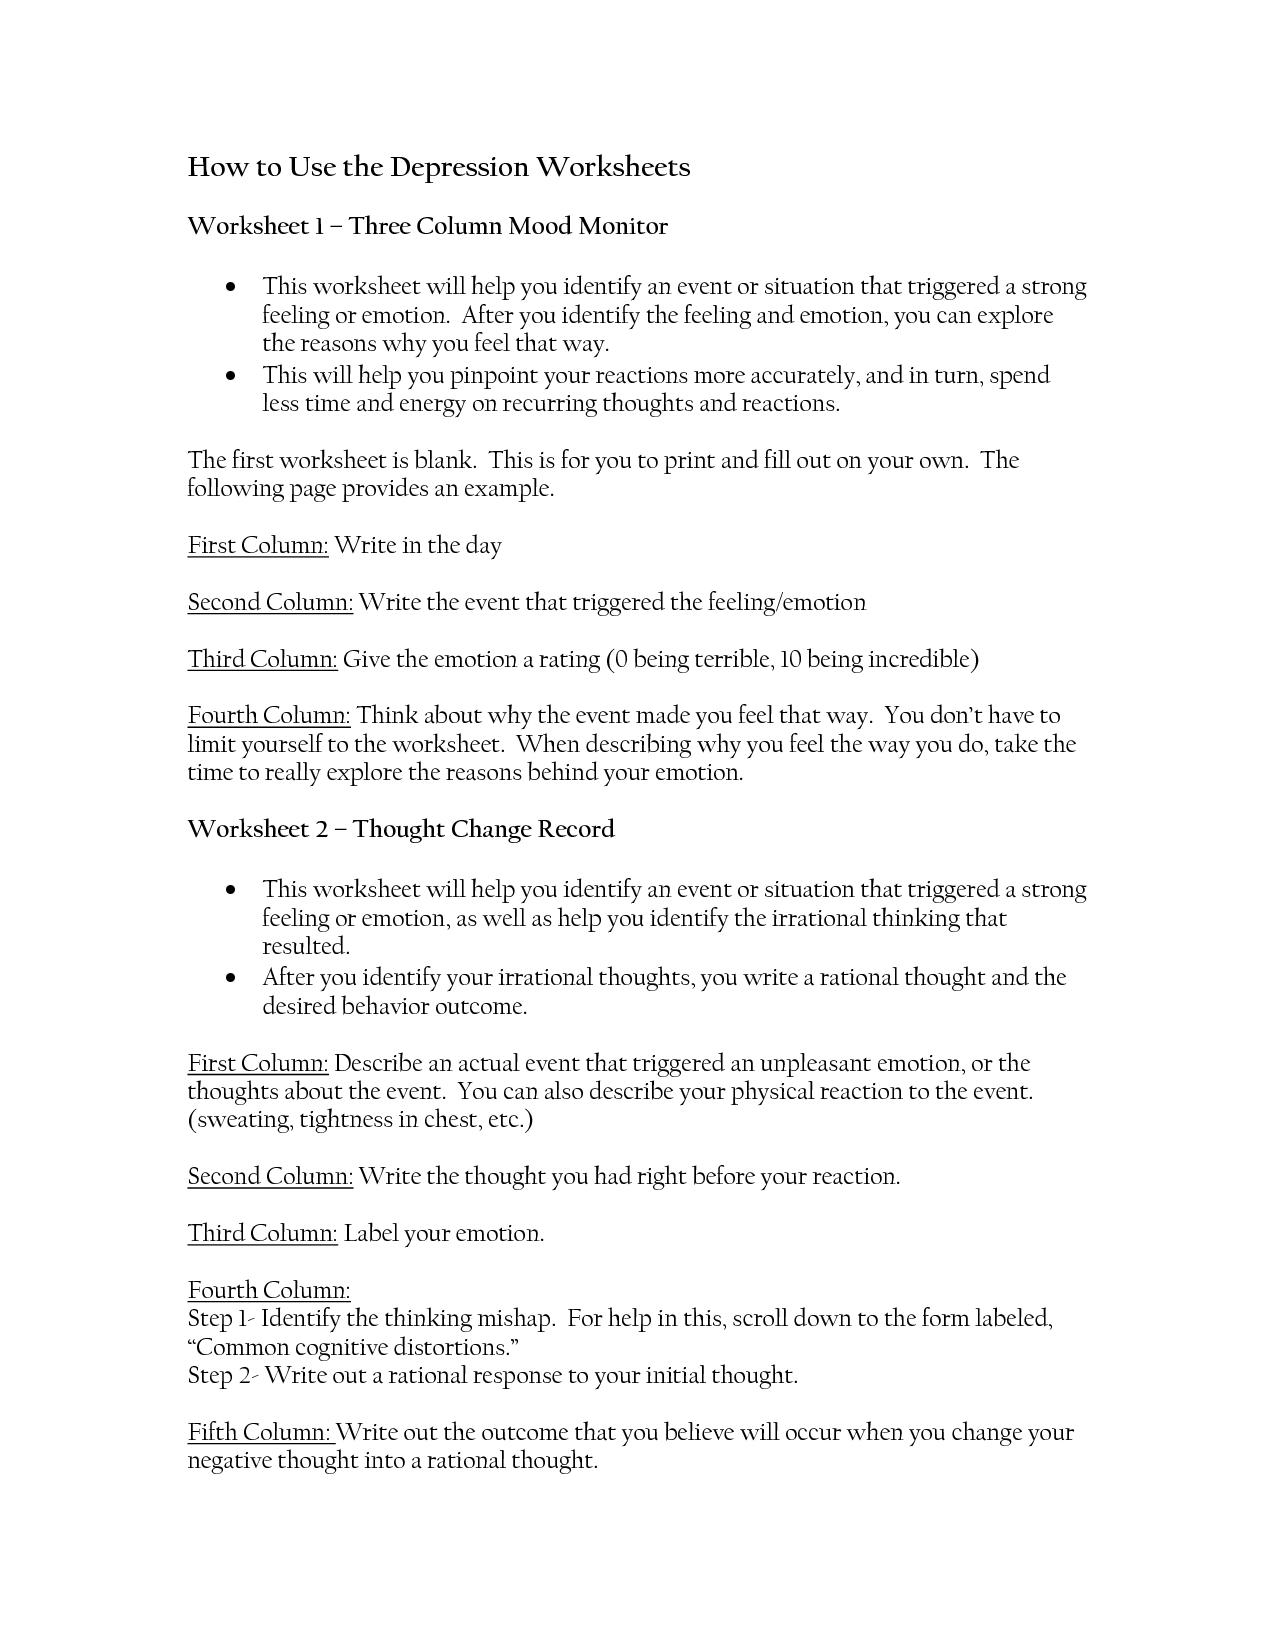 Rational Emotive Therapy Worksheet Depression – Rational Emotive Therapy Worksheet